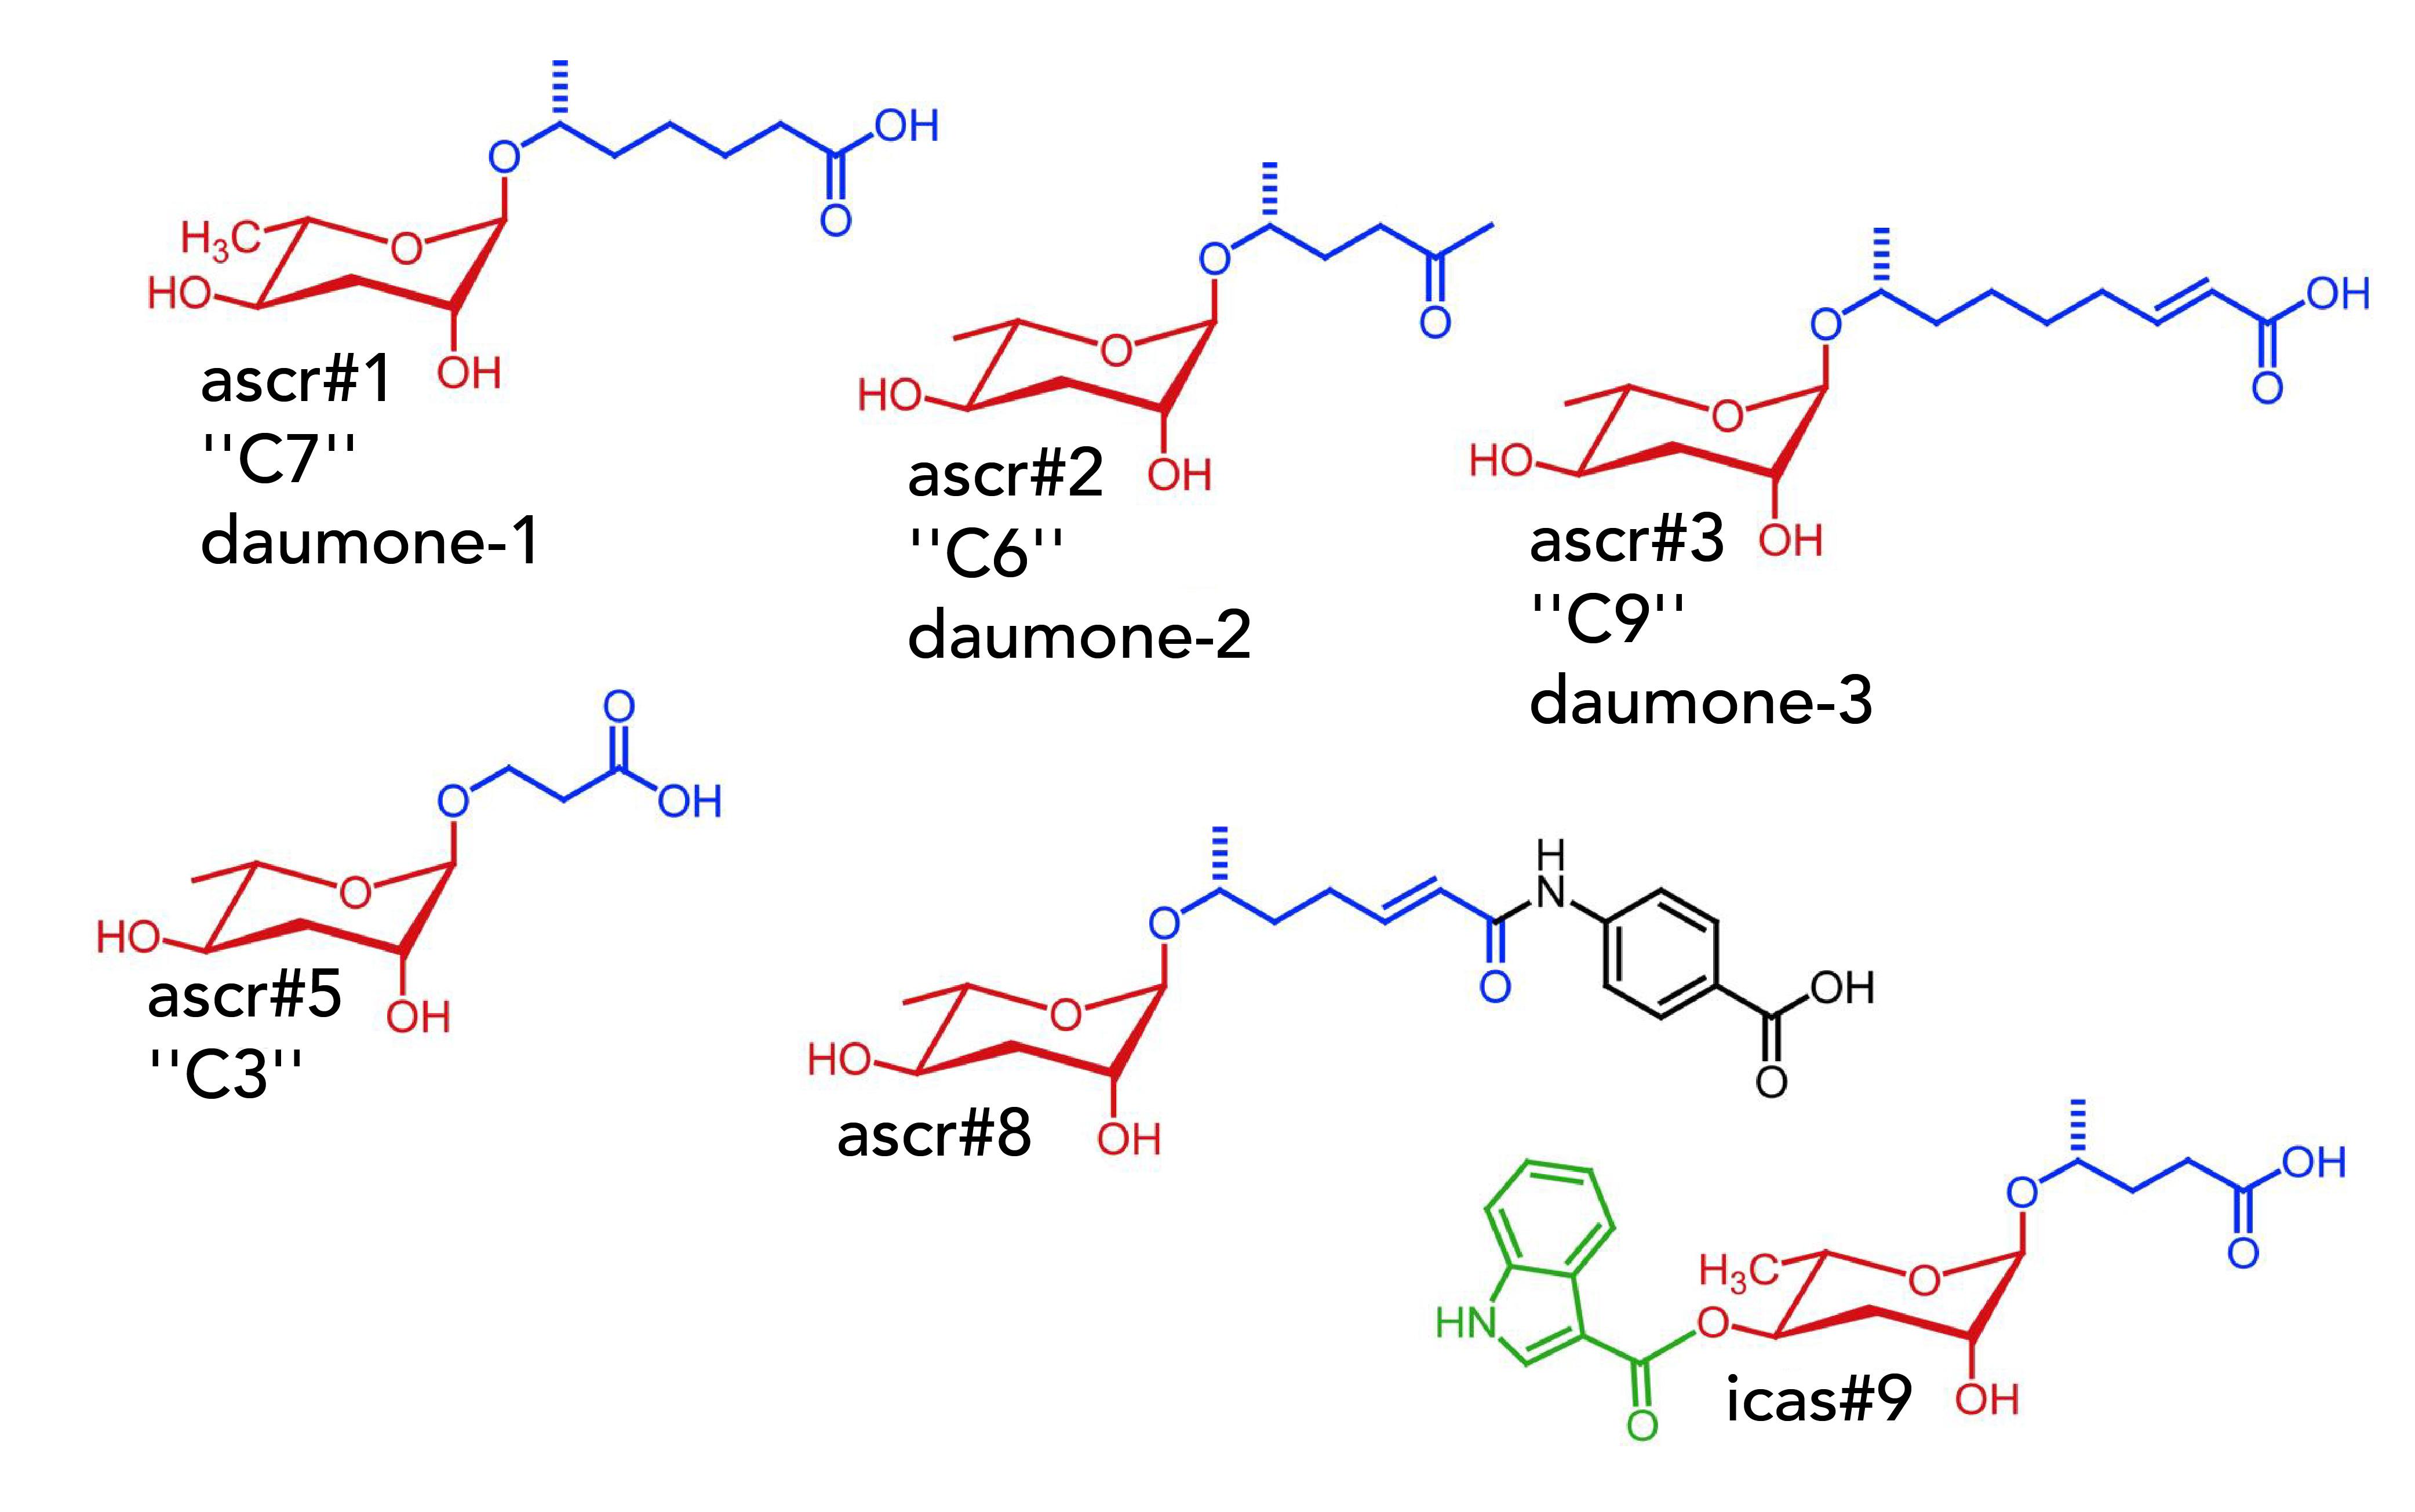 C.elegans 線蟲分泌的不同 Ascarosides 醣分子。中間紅色的六環結構基本相同,尾端鏈結的碳鏈長度和分子有些微差異。 資料來源│Jeong PY et al. Nature. 2005; Butcher RA et al. Nat Chem Biol. 2007; Srinivasan J et al. Nature. 2008; Srinivasan J et al. PLoS Bio 2012; Choe A et al. Curr Biol 2012